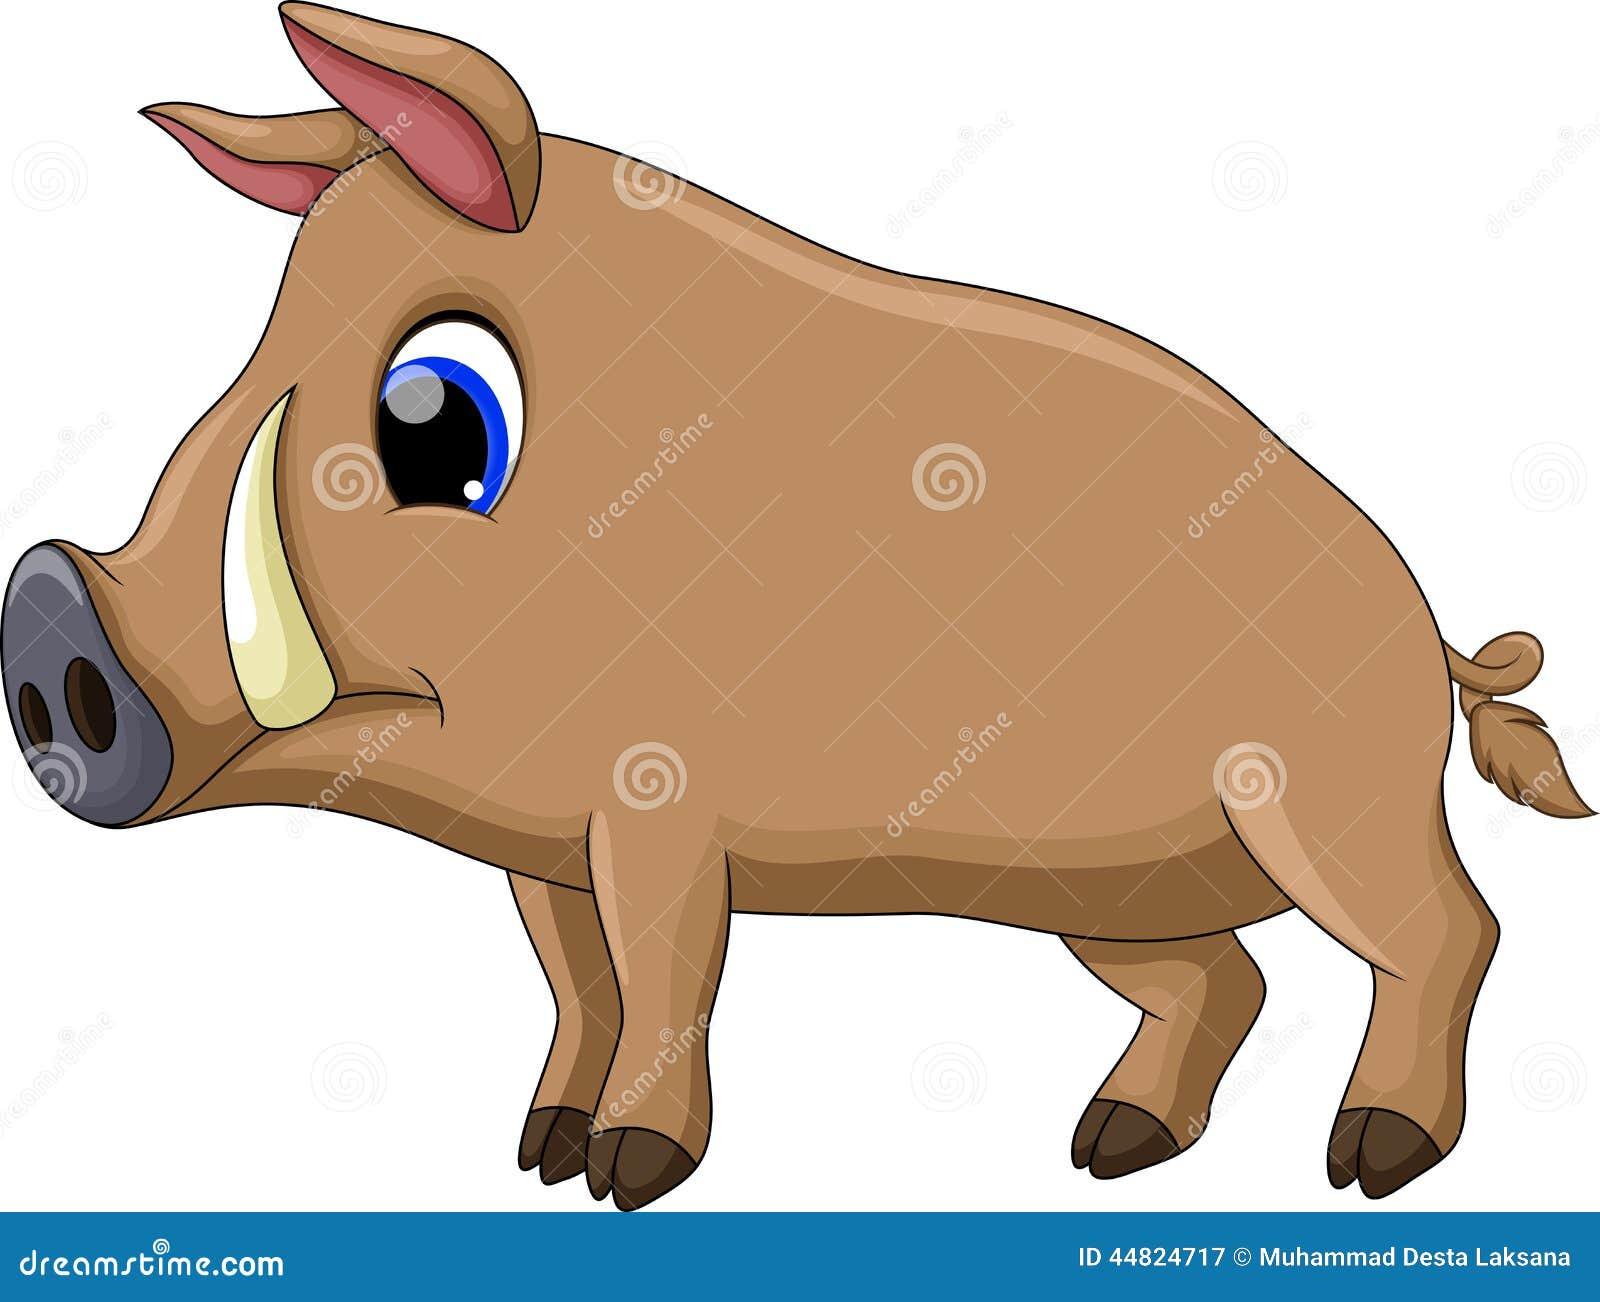 Cute Pig Cartoon Stock Illustration Image 44824717